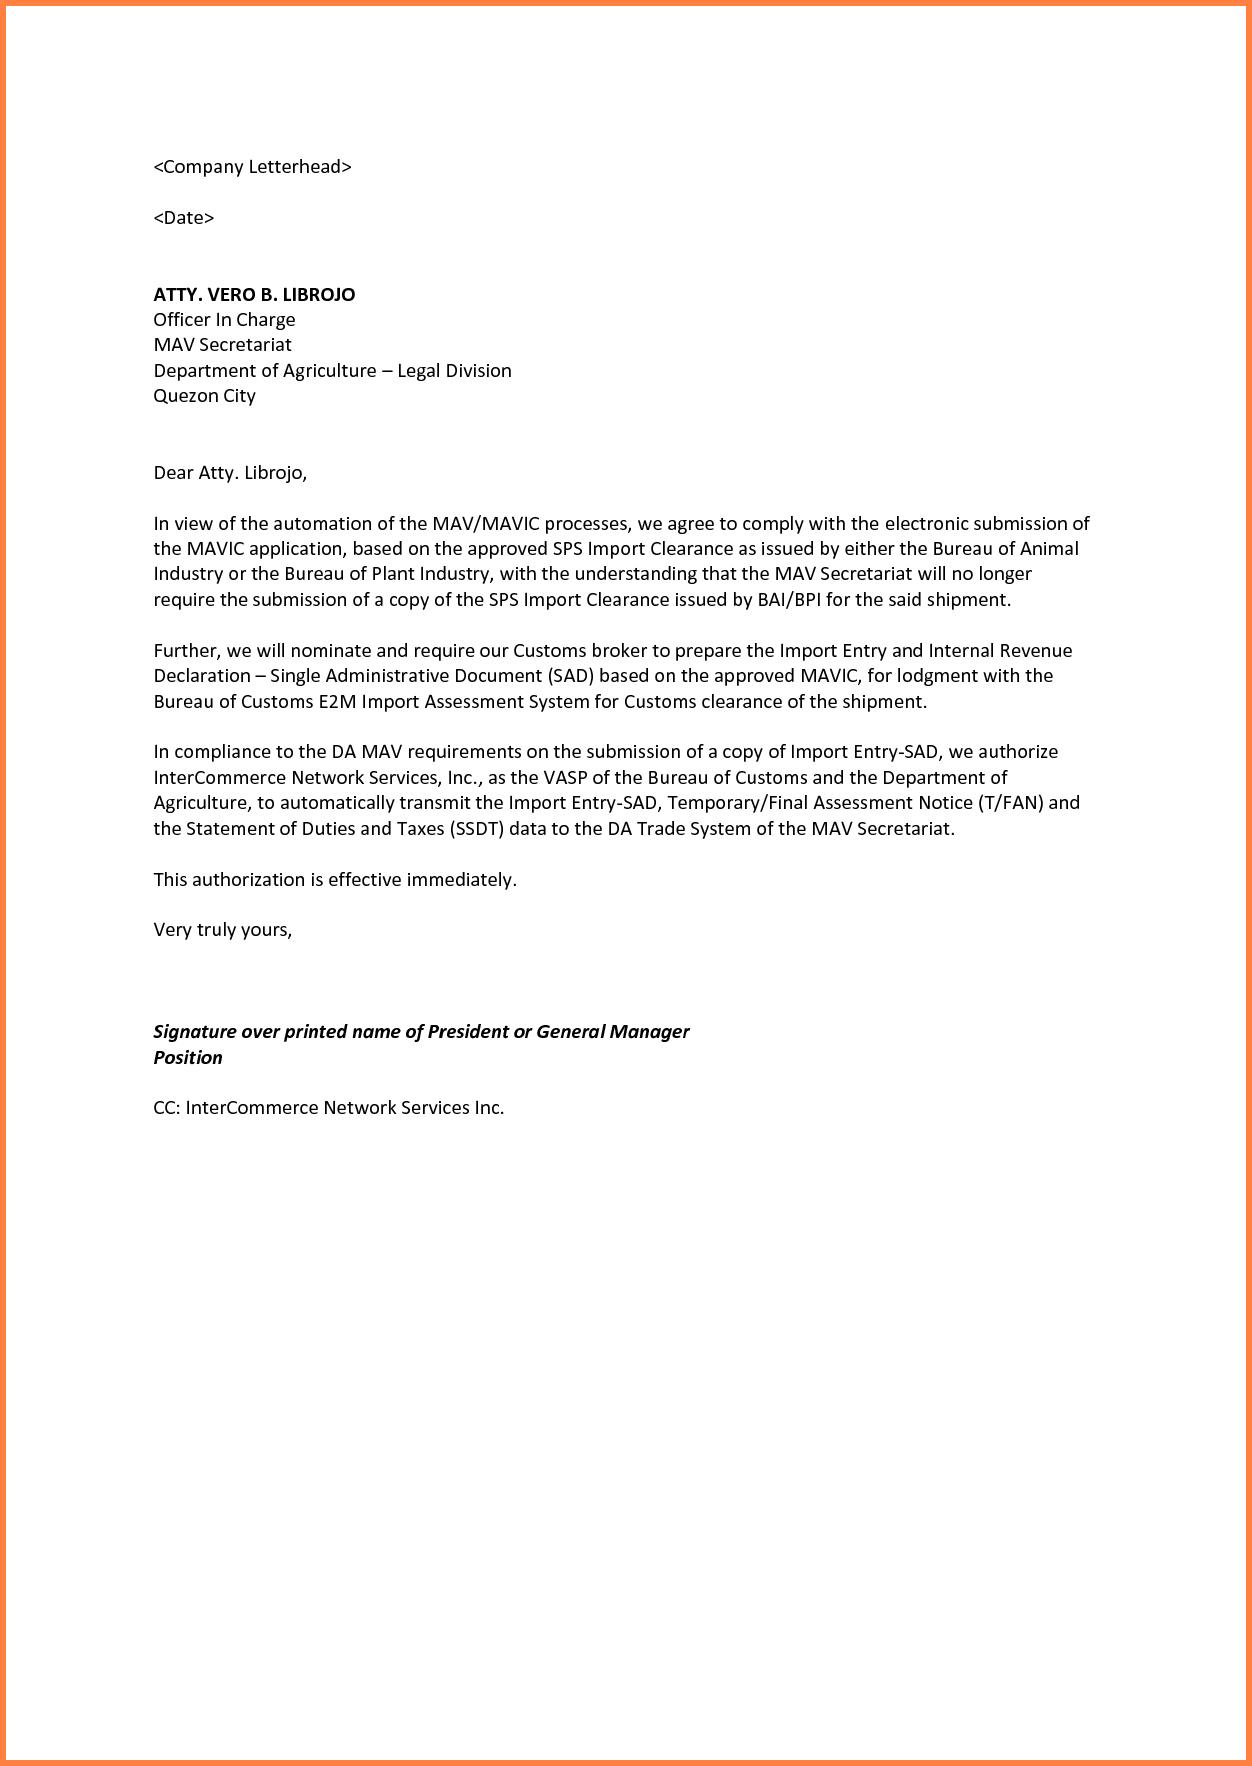 Letter Sample Authorization Lettermple Child Care Form Car Sale Guardianship Examples Pdf Word